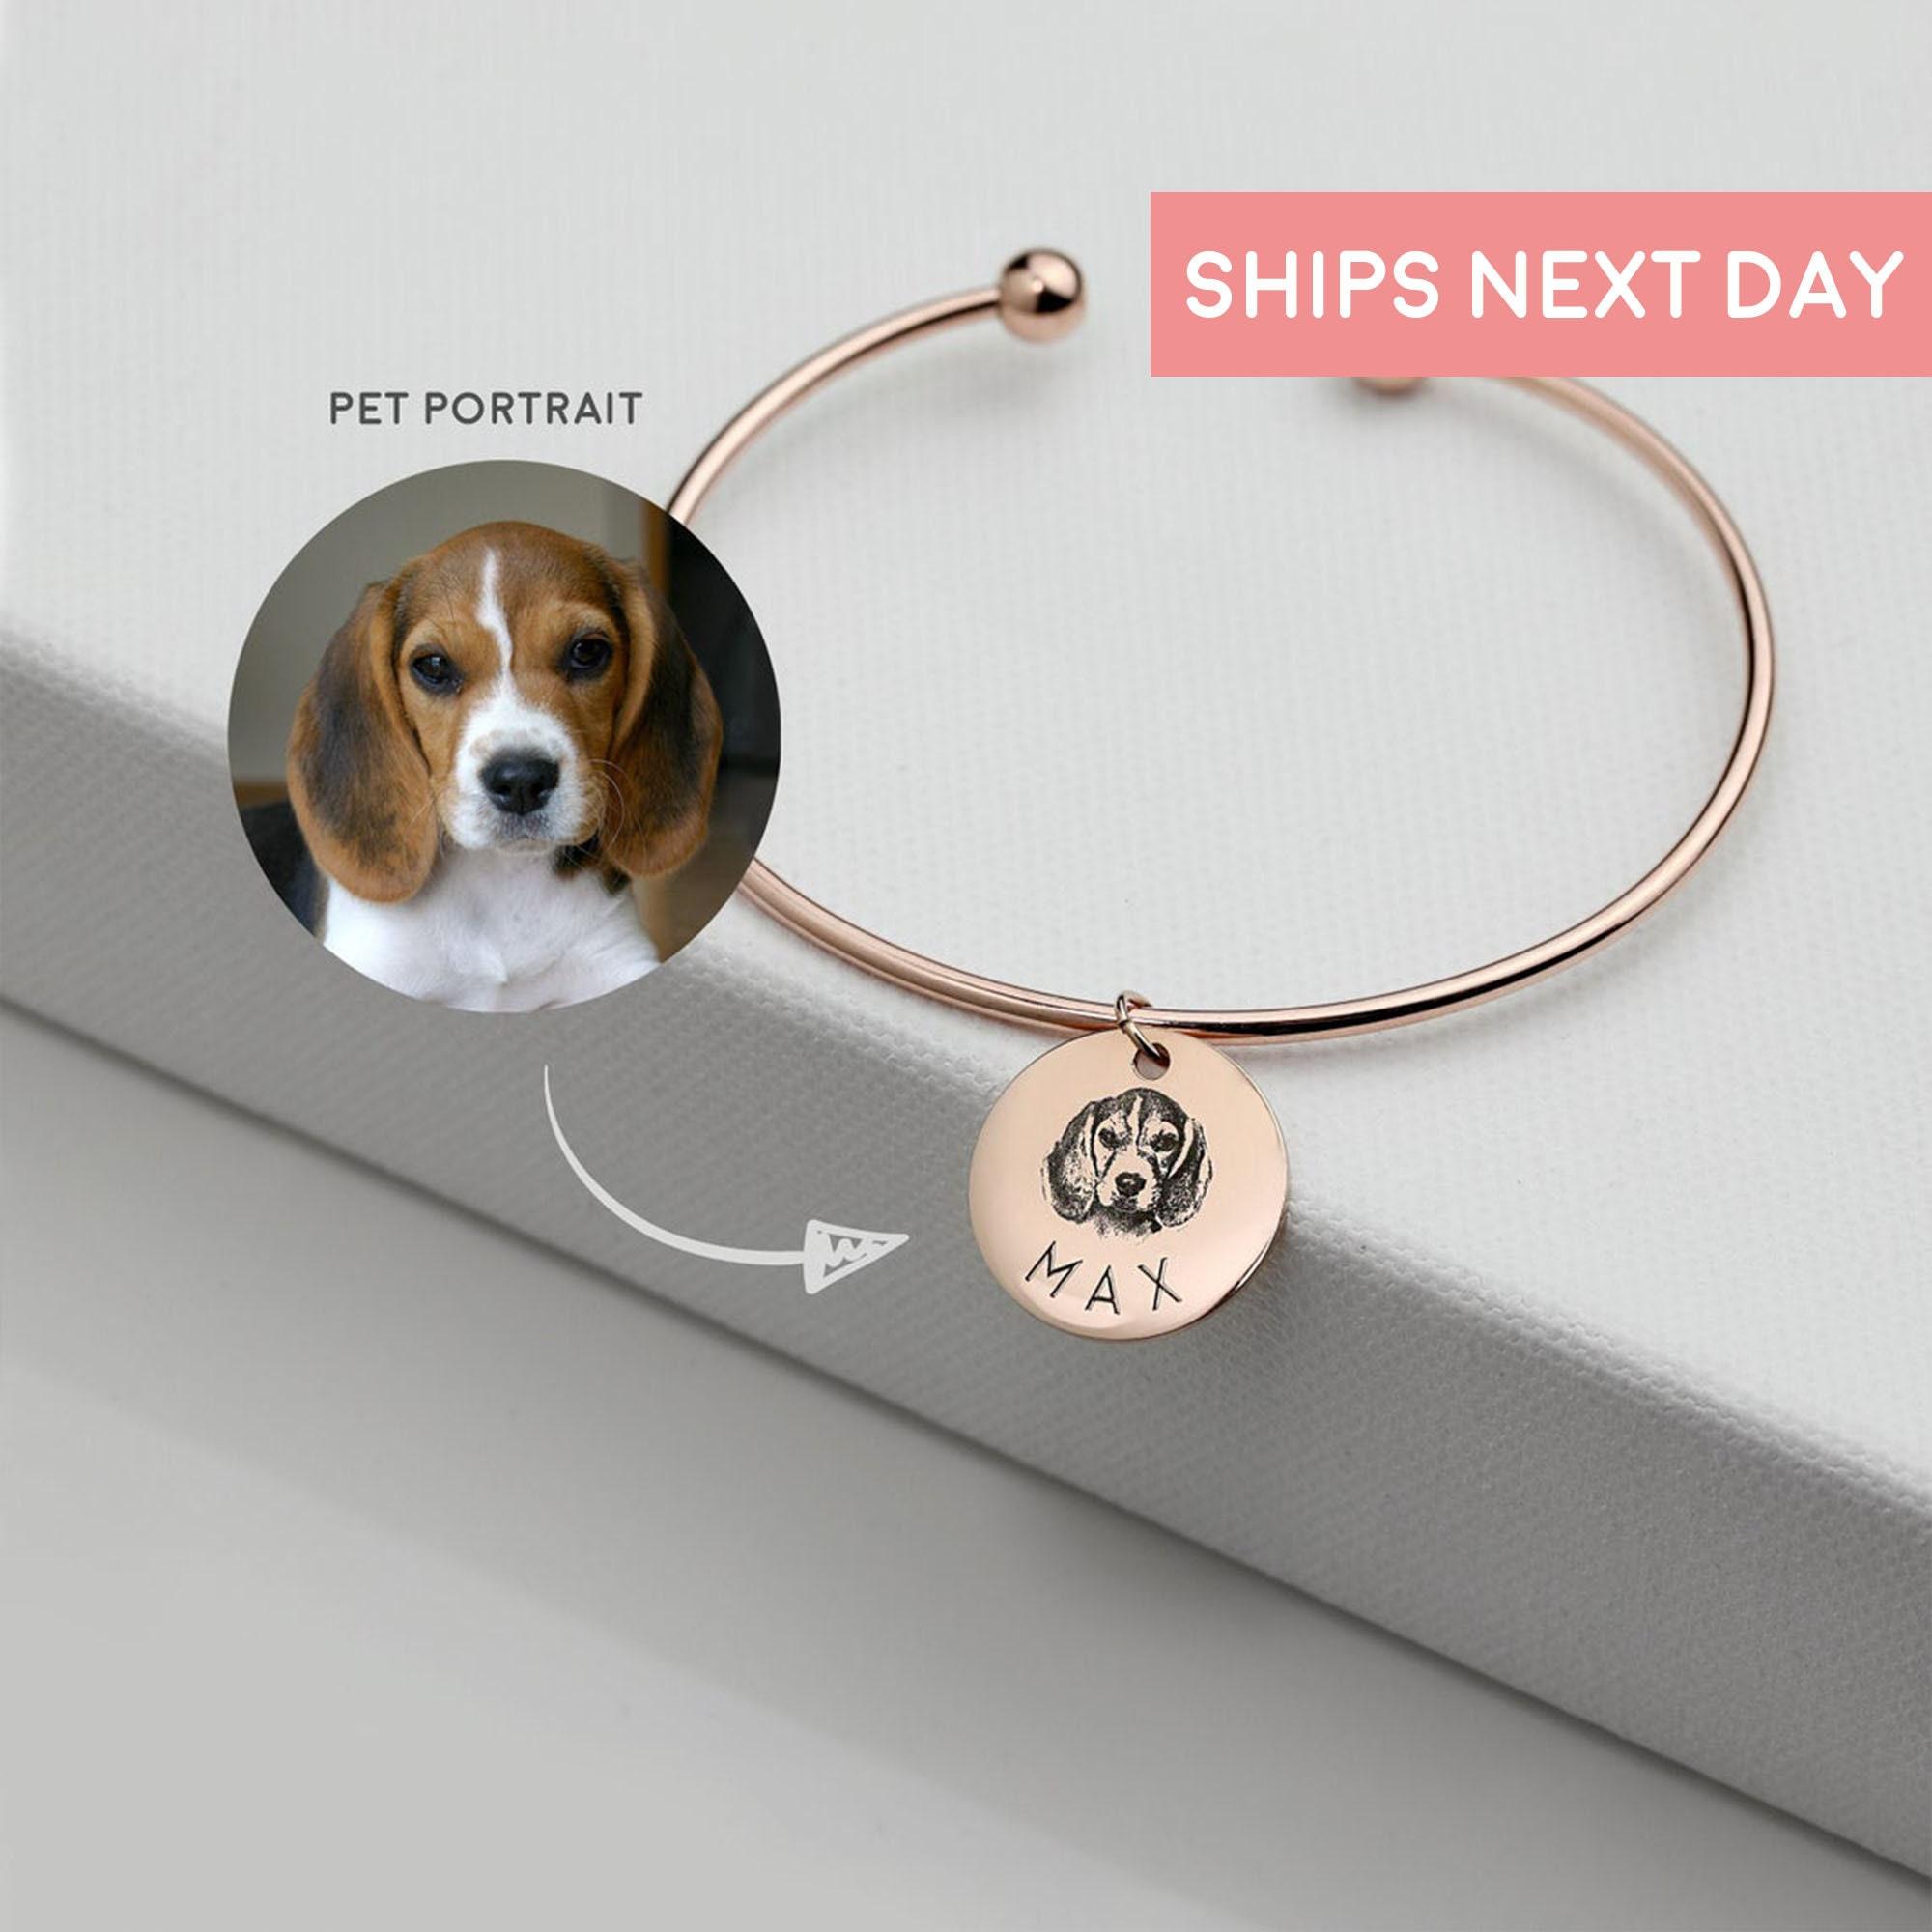 DIY Photo Bracelet,Christmas Gift Idea Custom Picture Bracelets,Dog Charm,Portrait Pet Pendant,Silver Photo Jewelry Custom Pet Bracelet